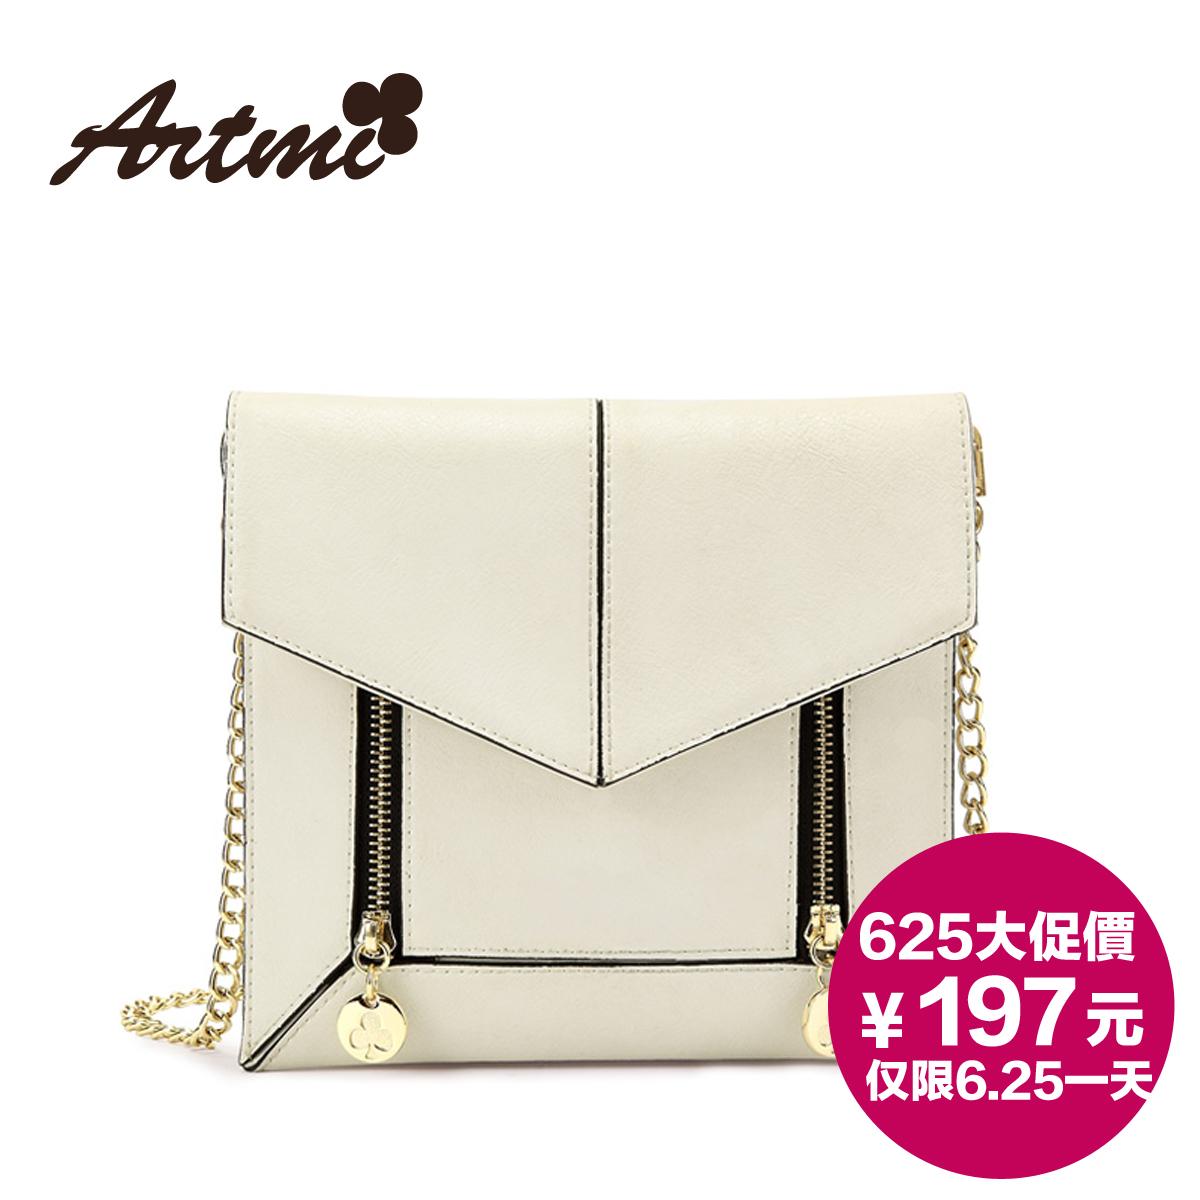 Сумка Artmi apc0616 Artmi2015 OL сумка artmi ane0401 artmi2014